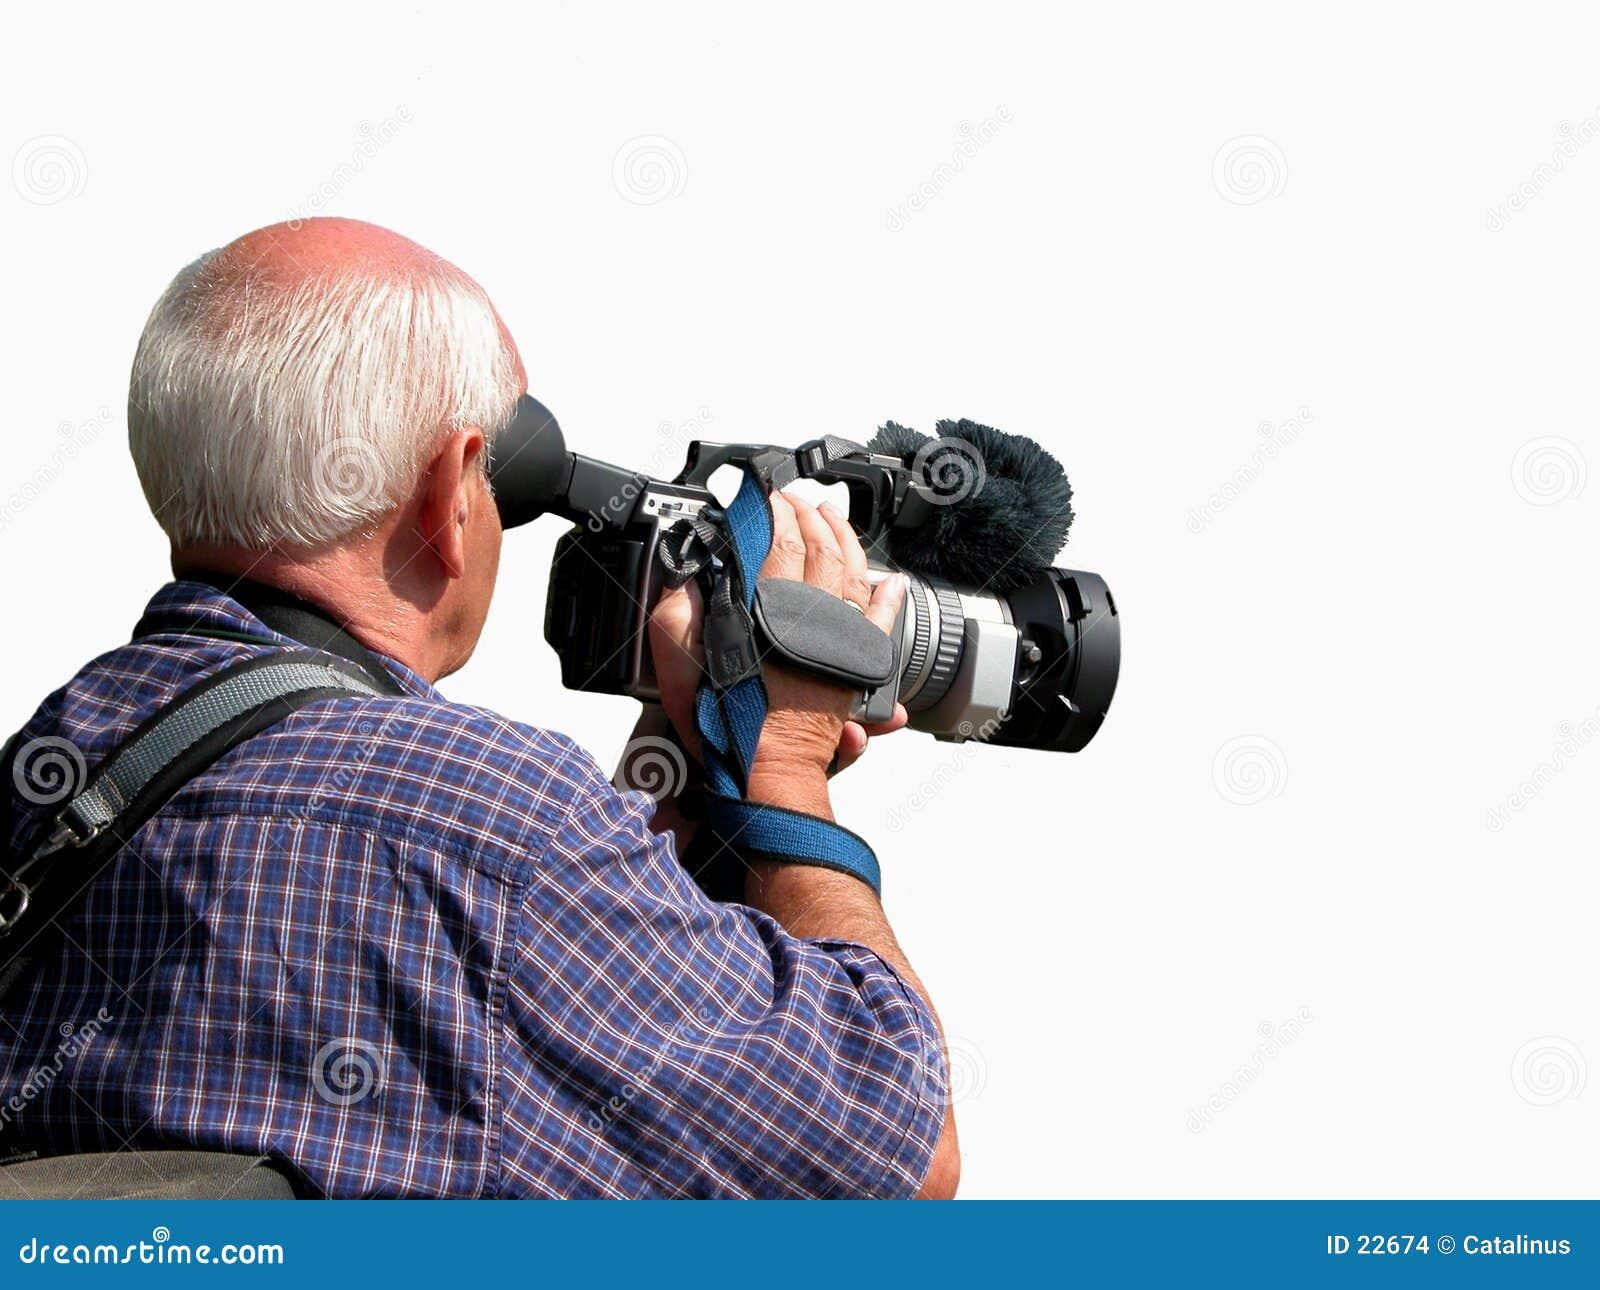 Download 浓度 库存照片. 图片 包括有 电影, 现有量, 蓝色, 空白, 照相机, 影片, 浓度 - 22674